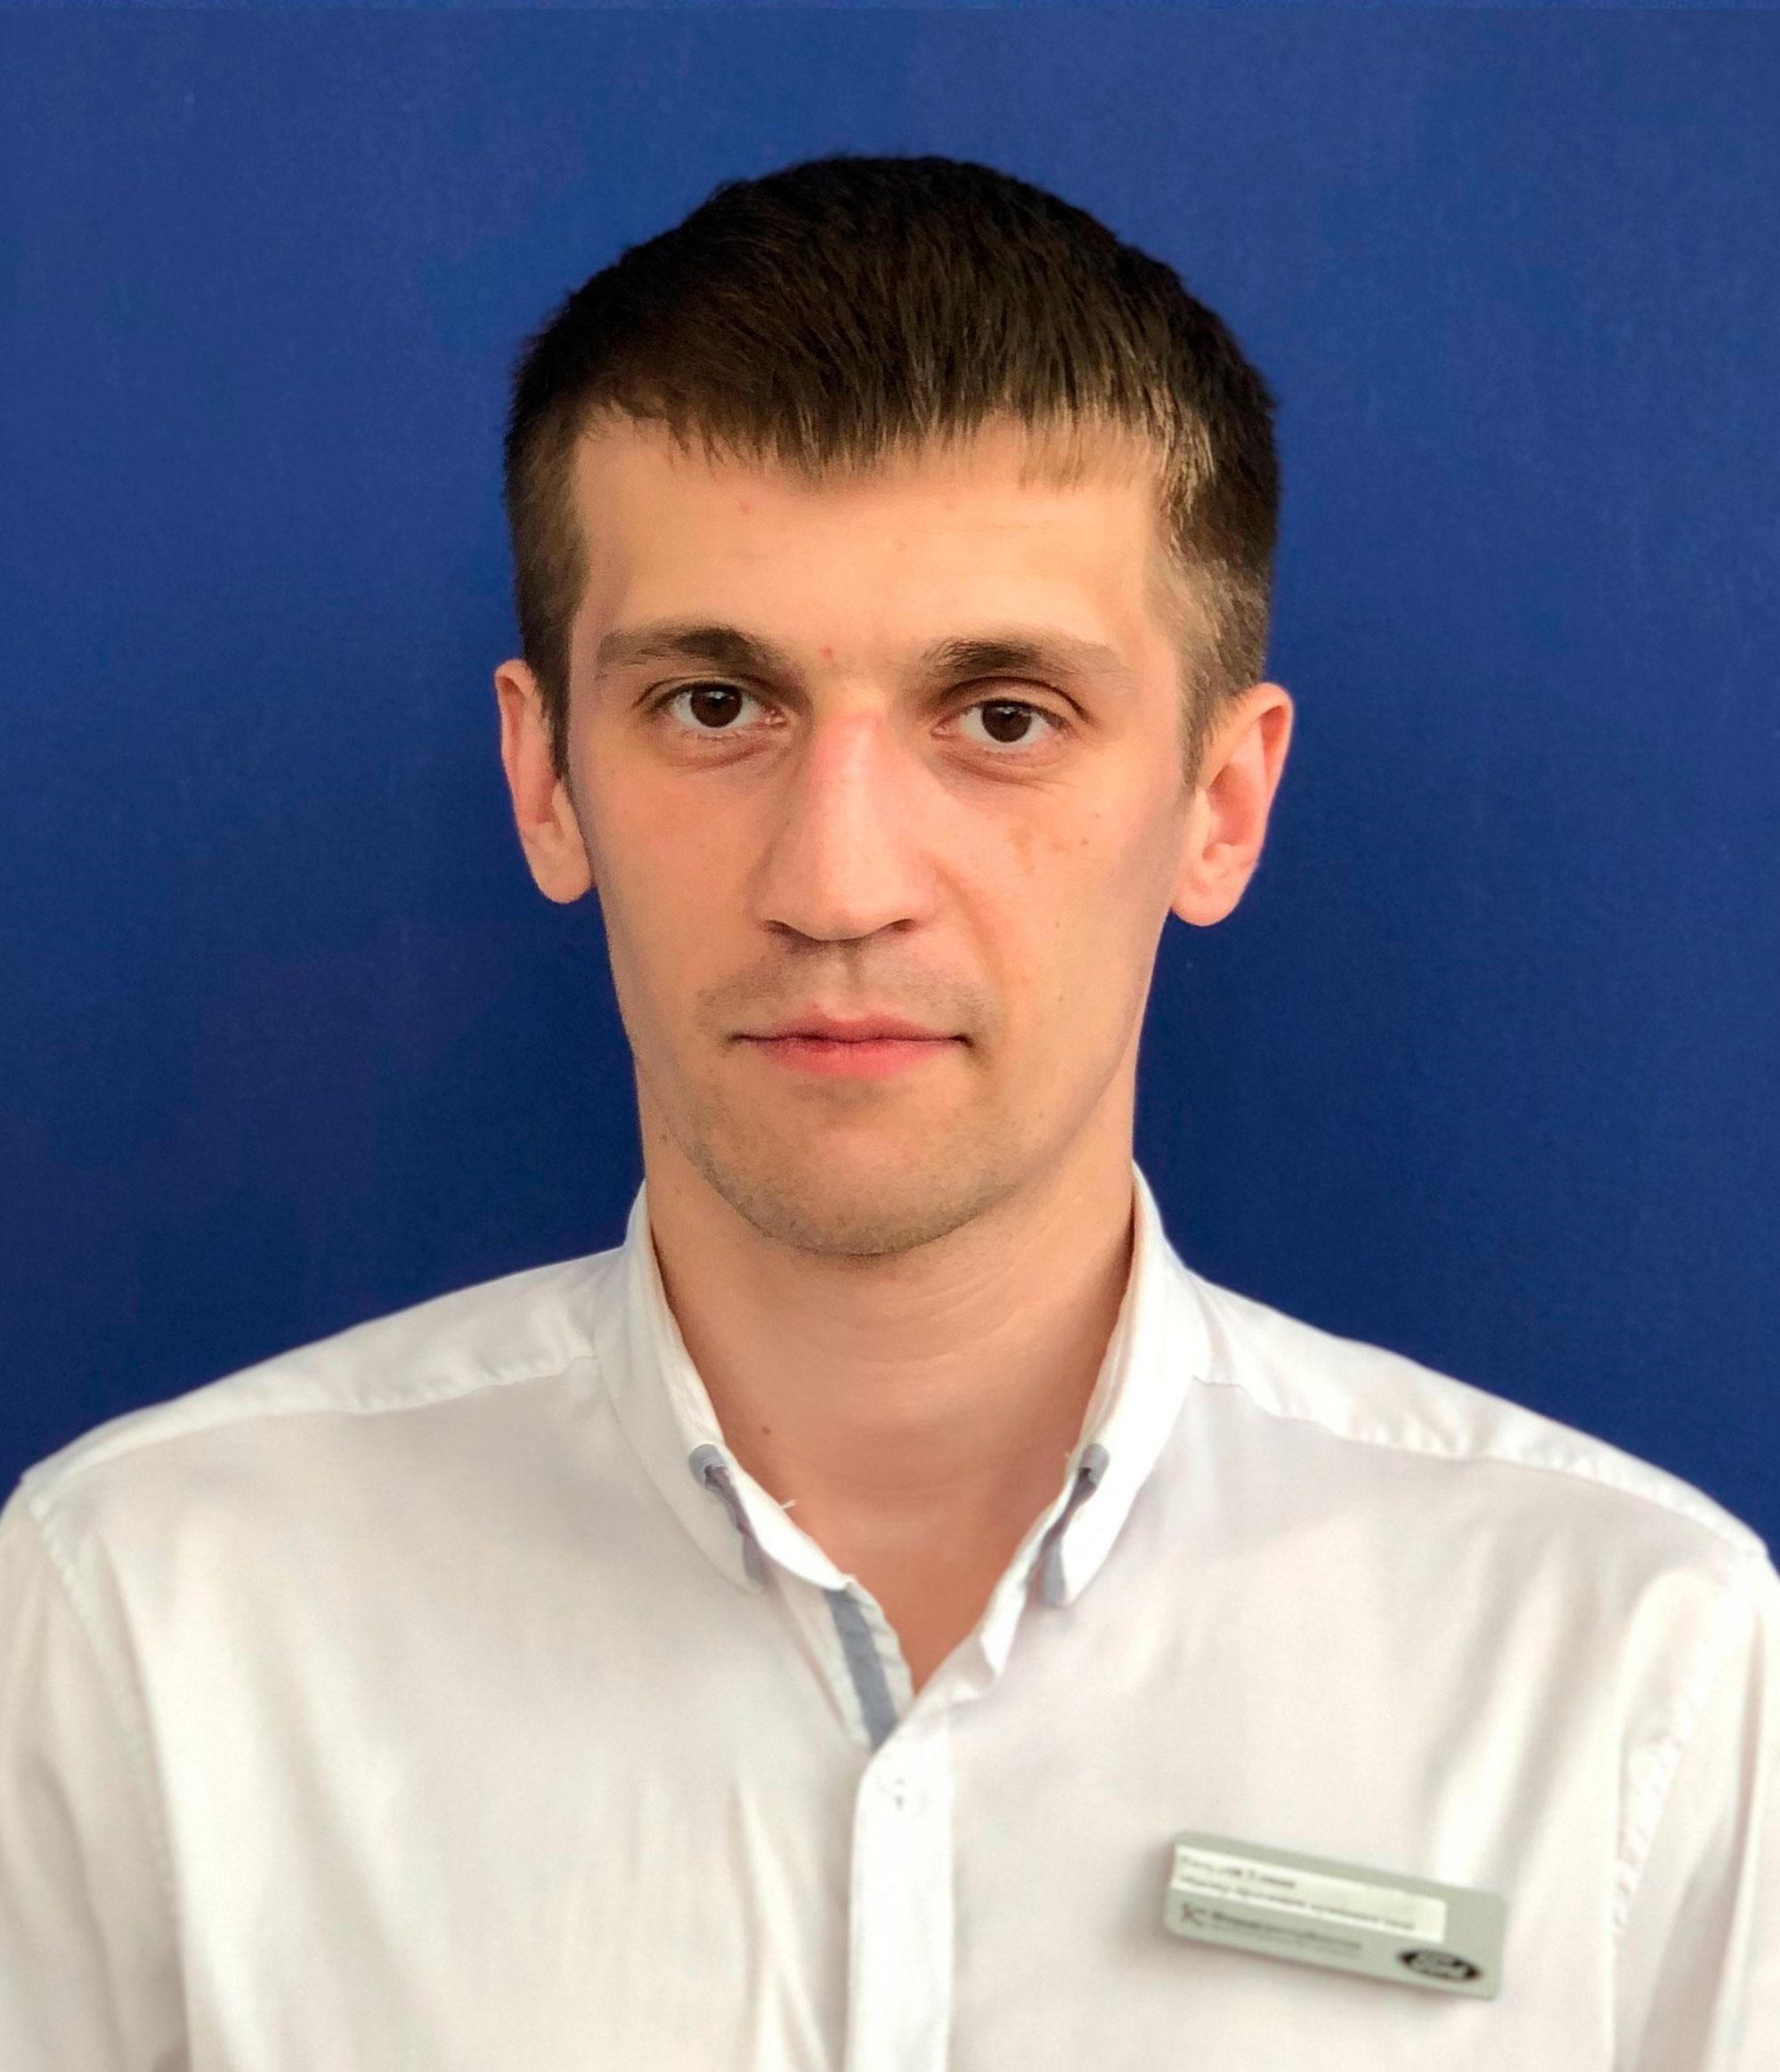 Томин Евгений